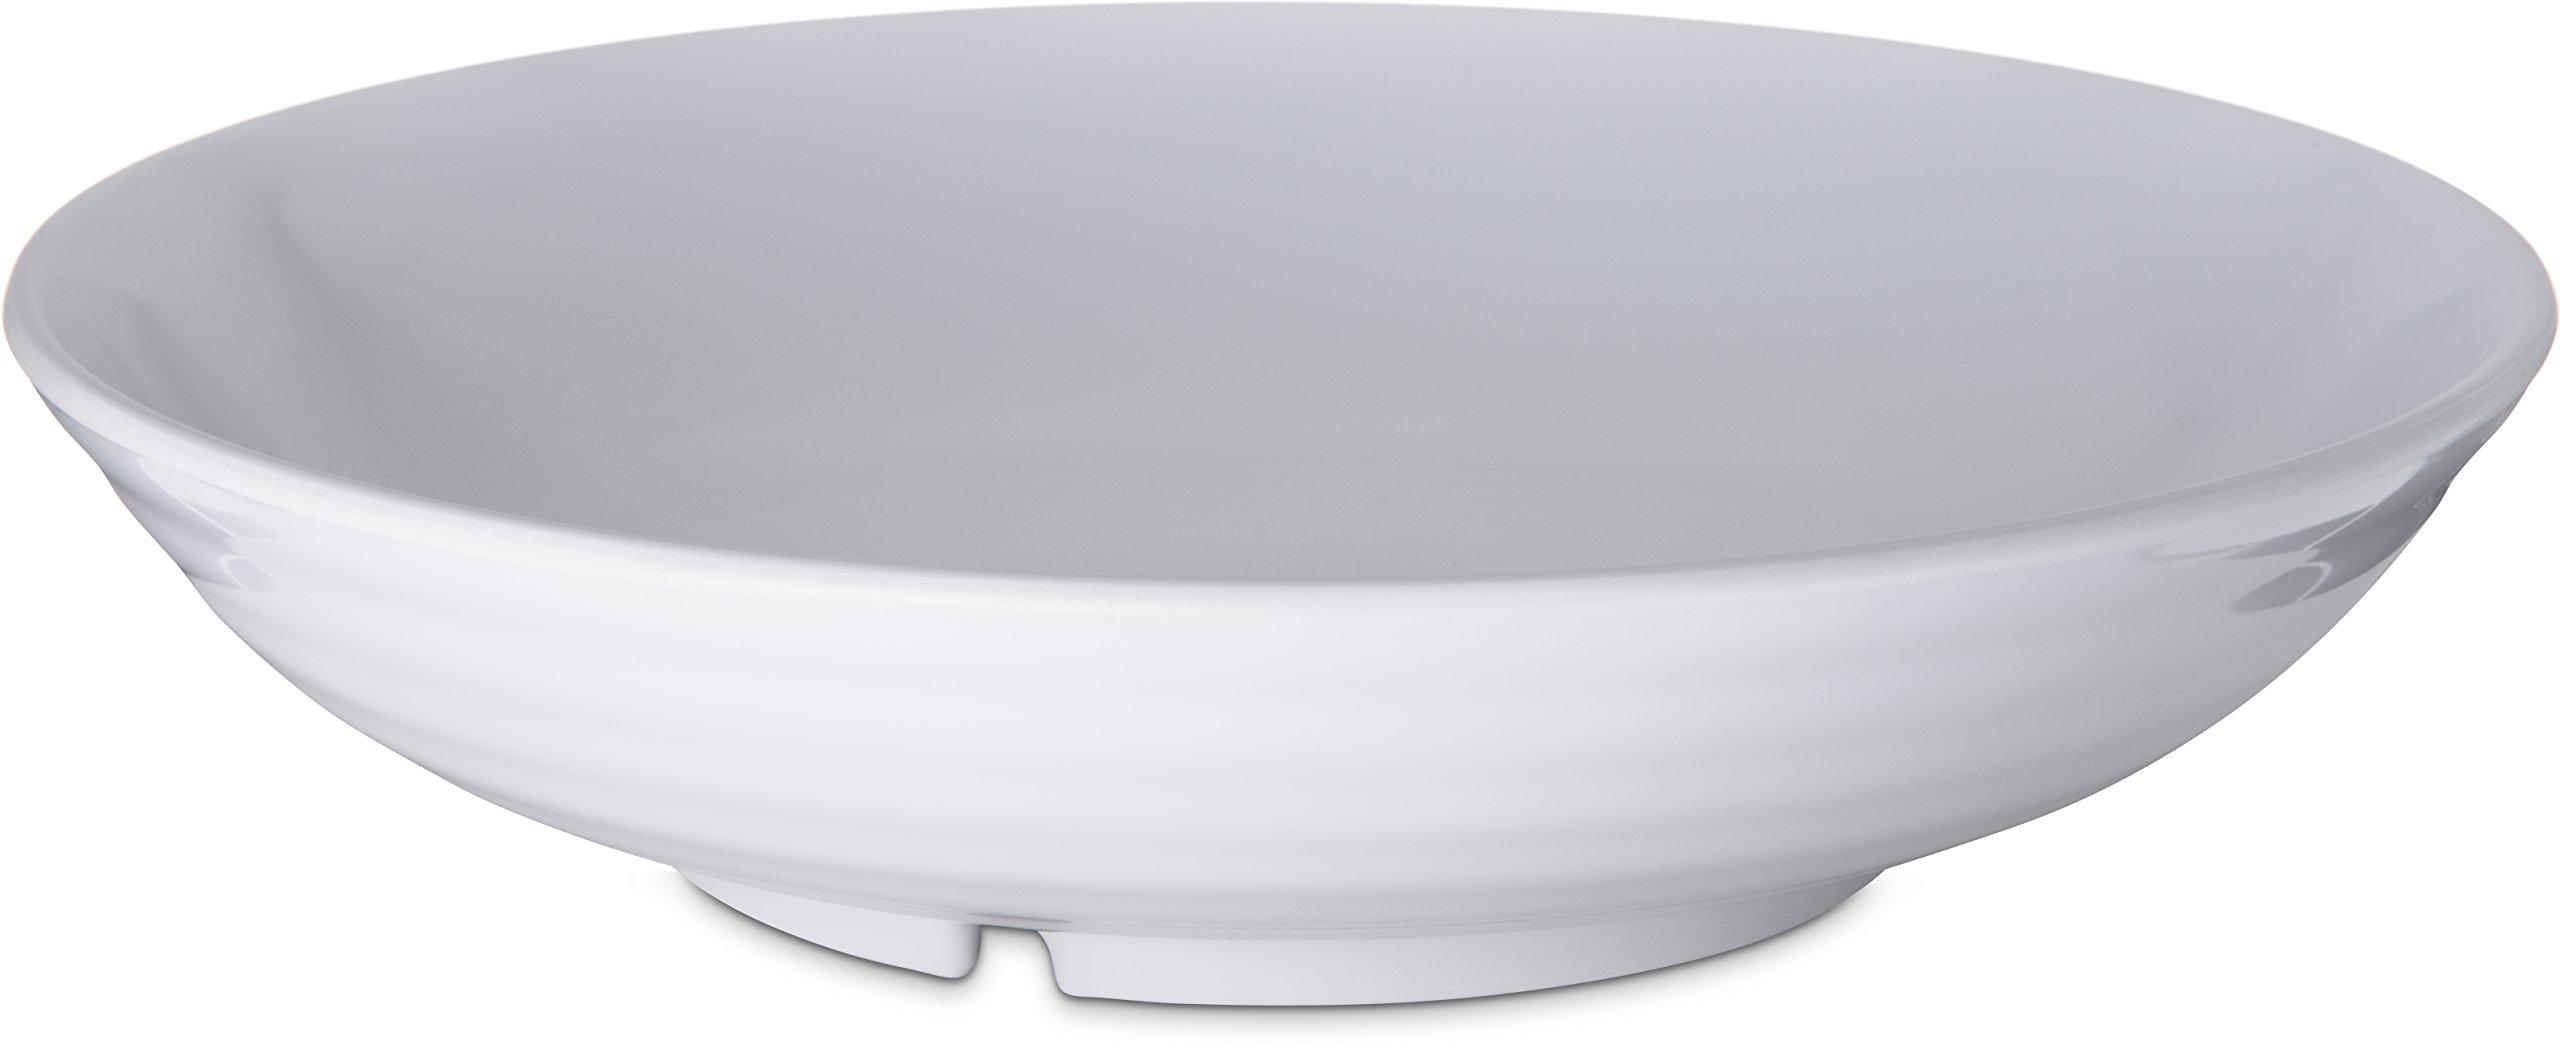 Carlisle 791002 Designer Displayware Melamine Pasta Bowl, 5 lbs Capacity, 10-1/2'' Diameter x 2-1/2'' Height, White (Case of 4)